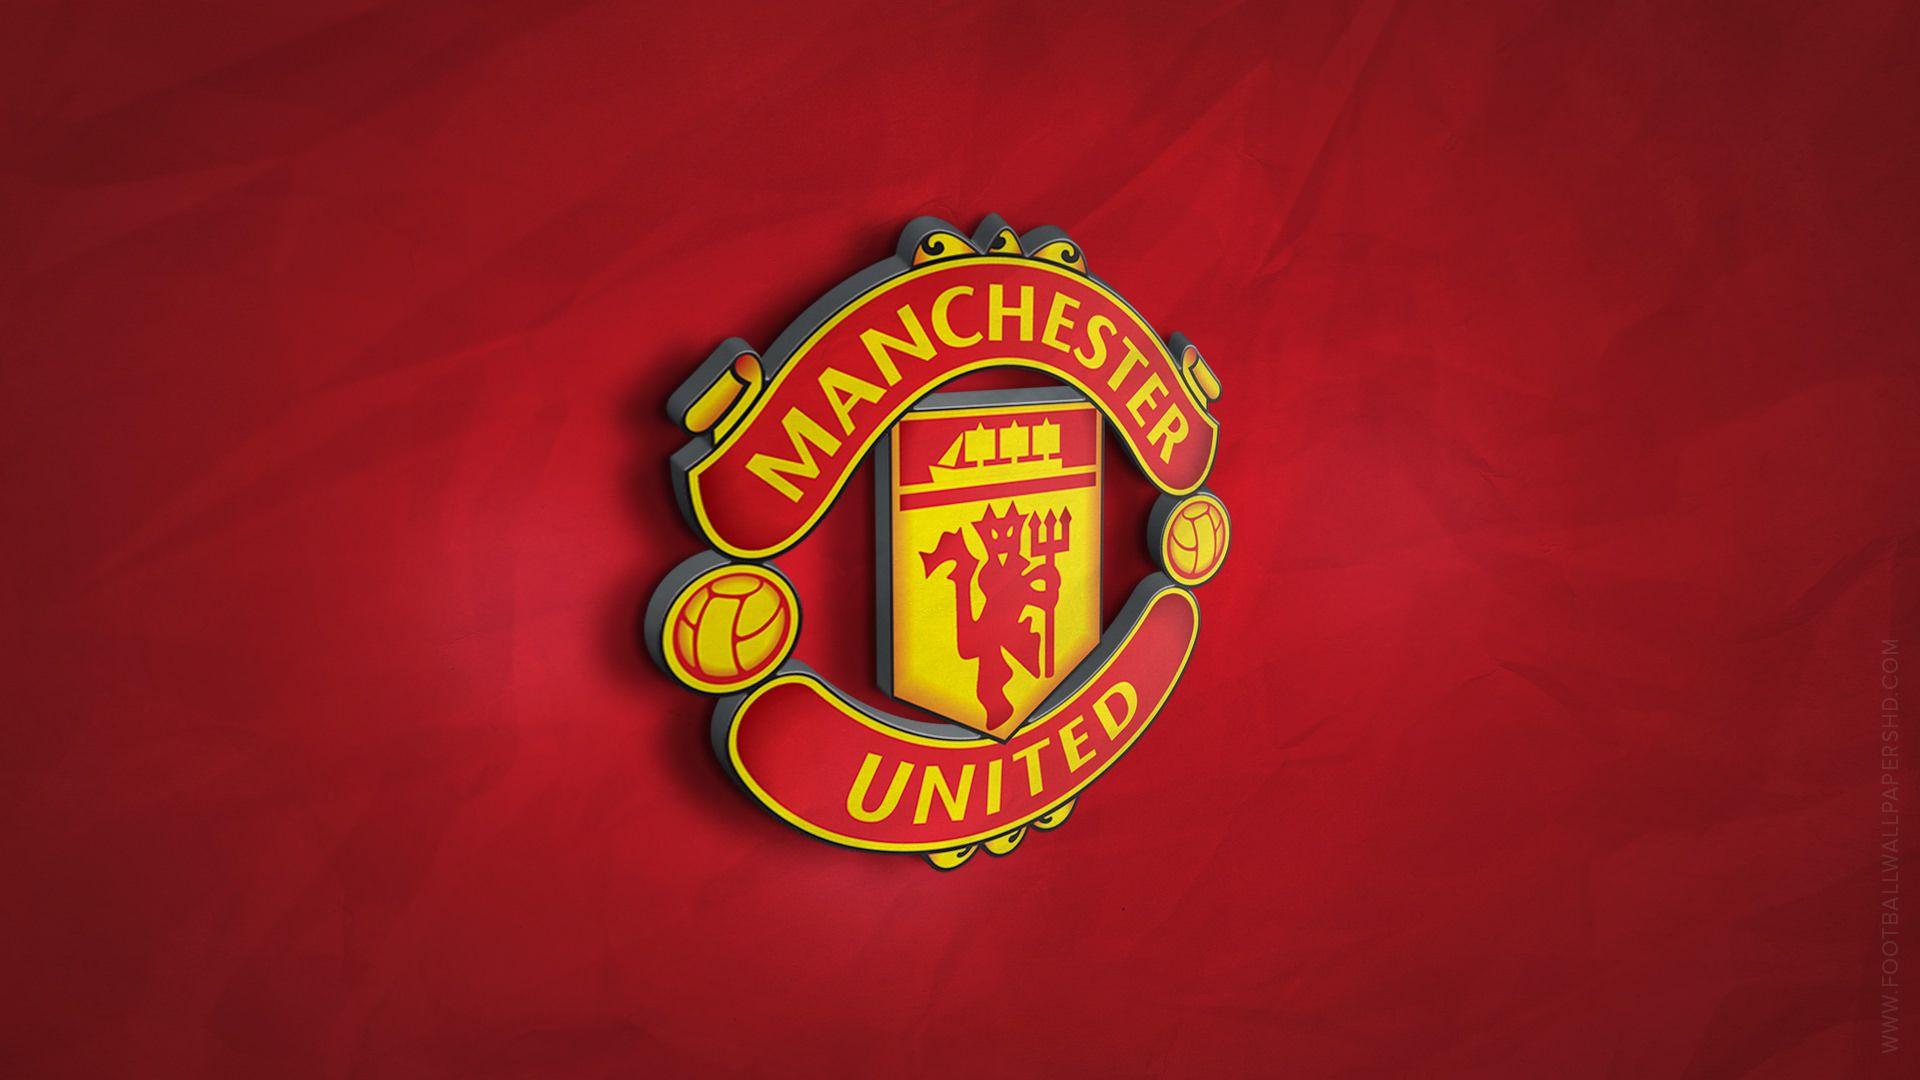 Newcastle United Bedroom Wallpaper Manchester United 3d Logo Wallpaper Football Wallpapers Hd